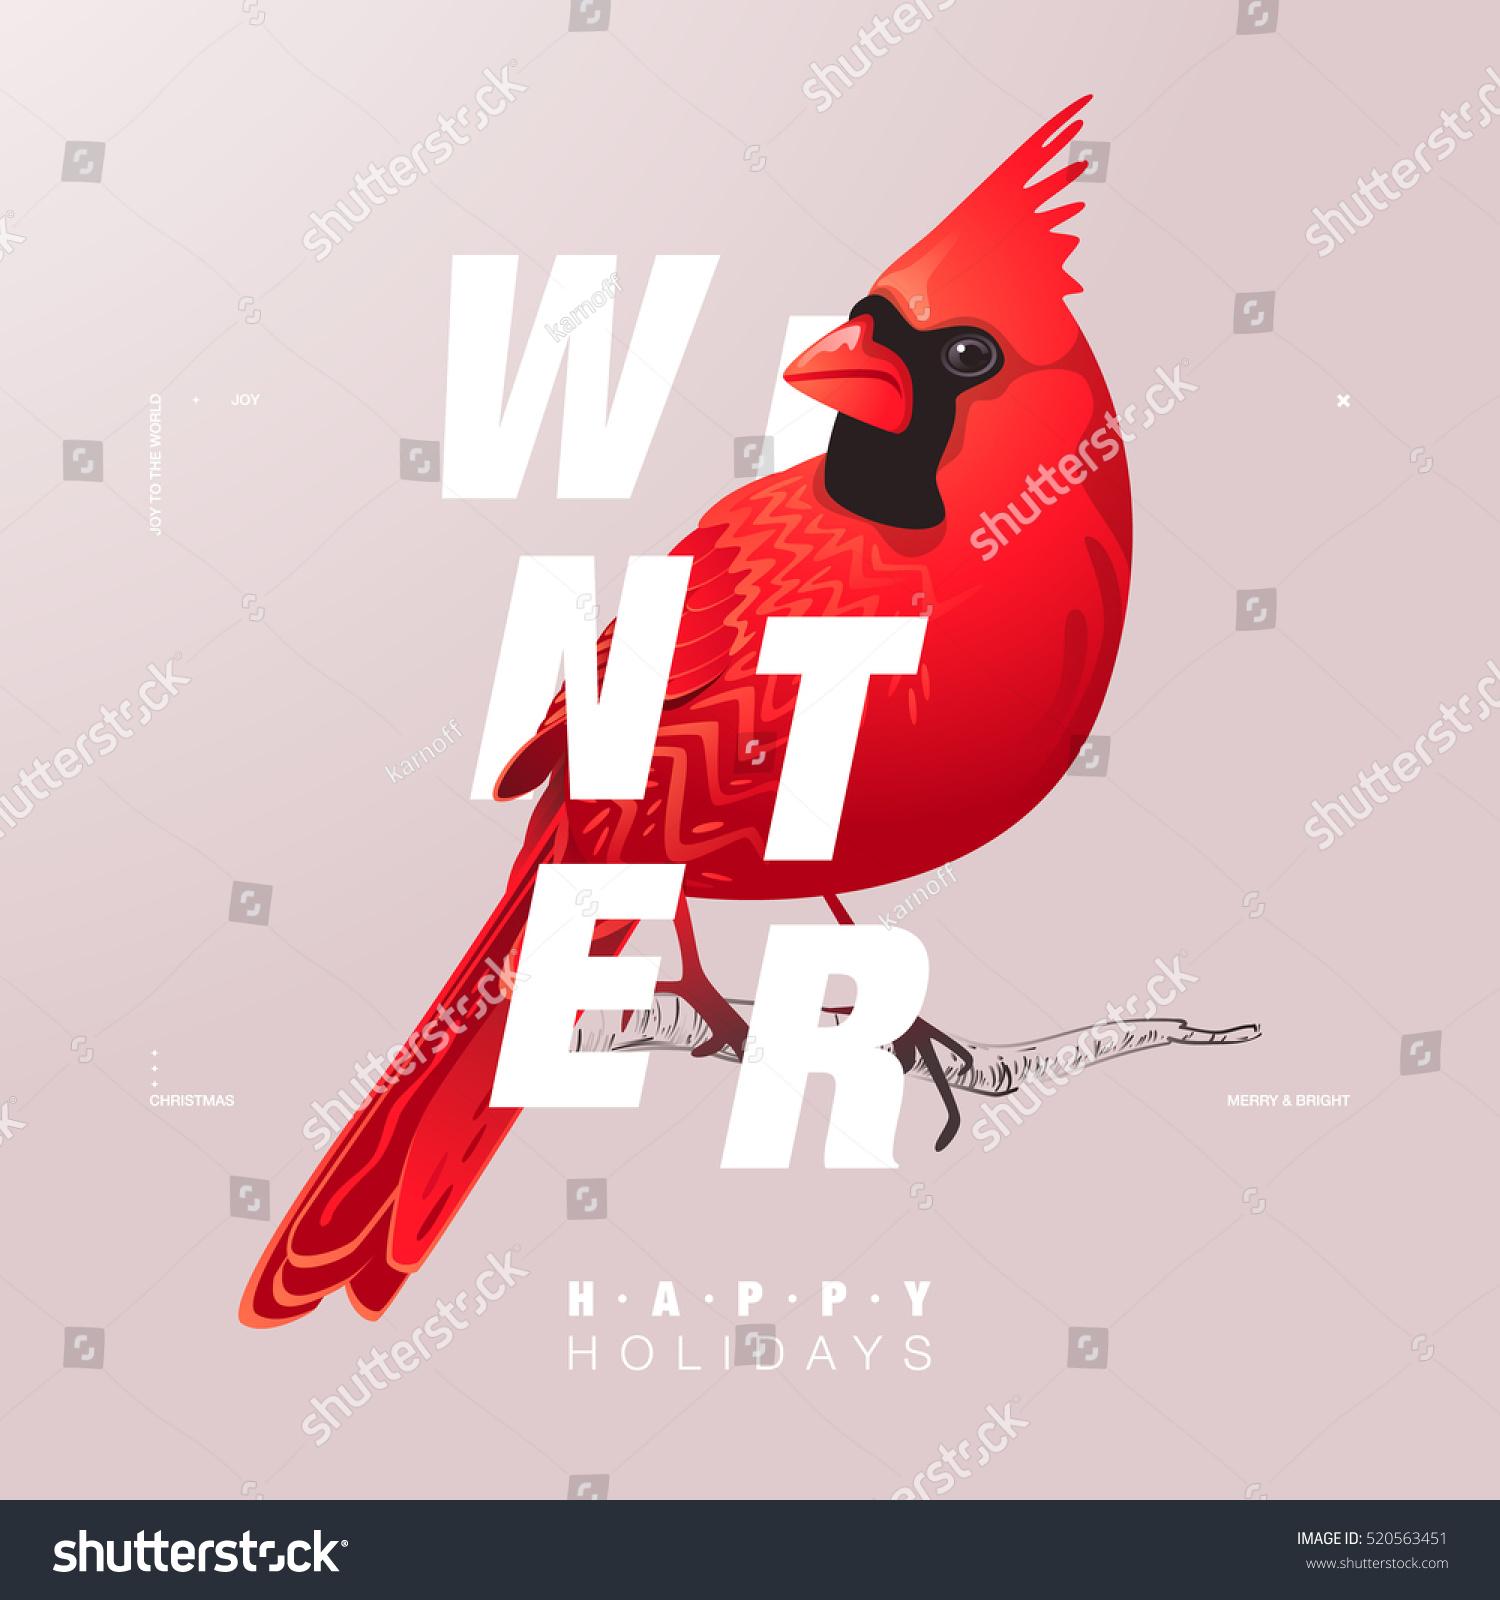 Christmas Winter Bird Illustration Modern Typography Stock Vector ...